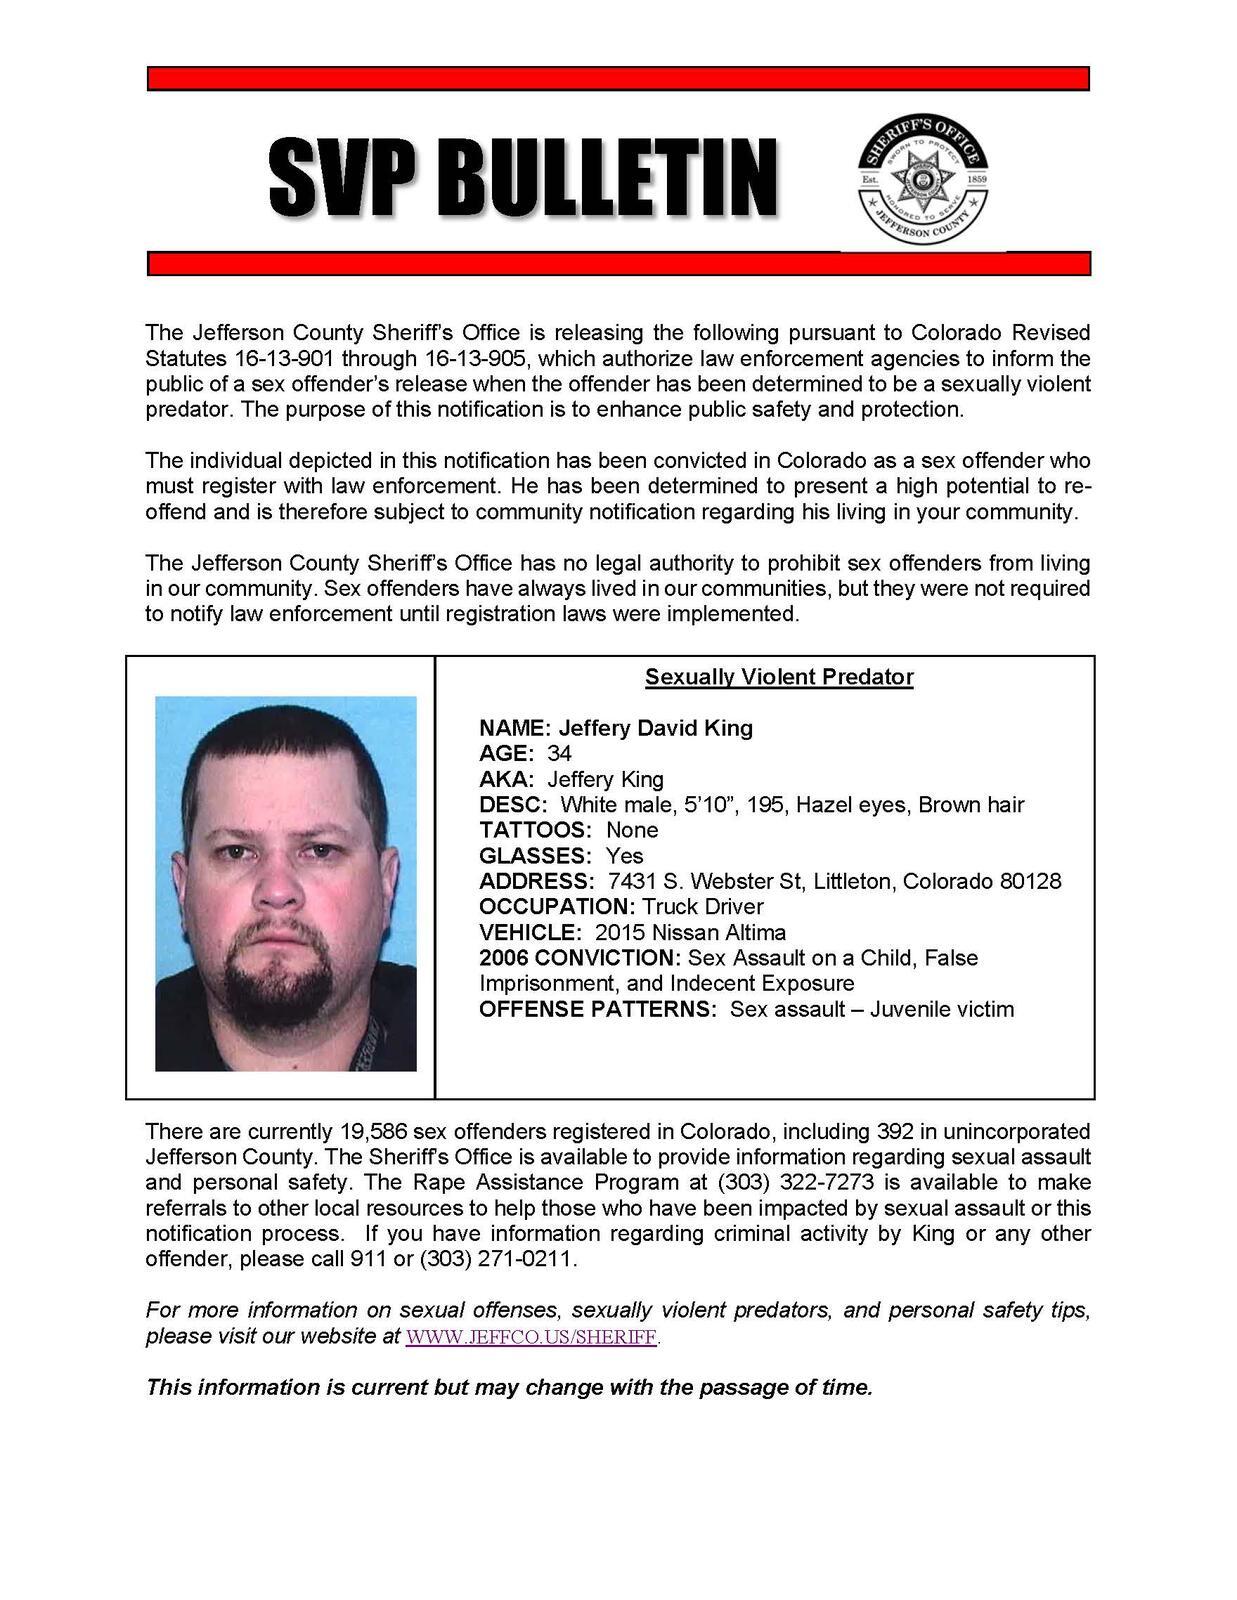 Notification of Sexually Violent Predator (Jefferson County